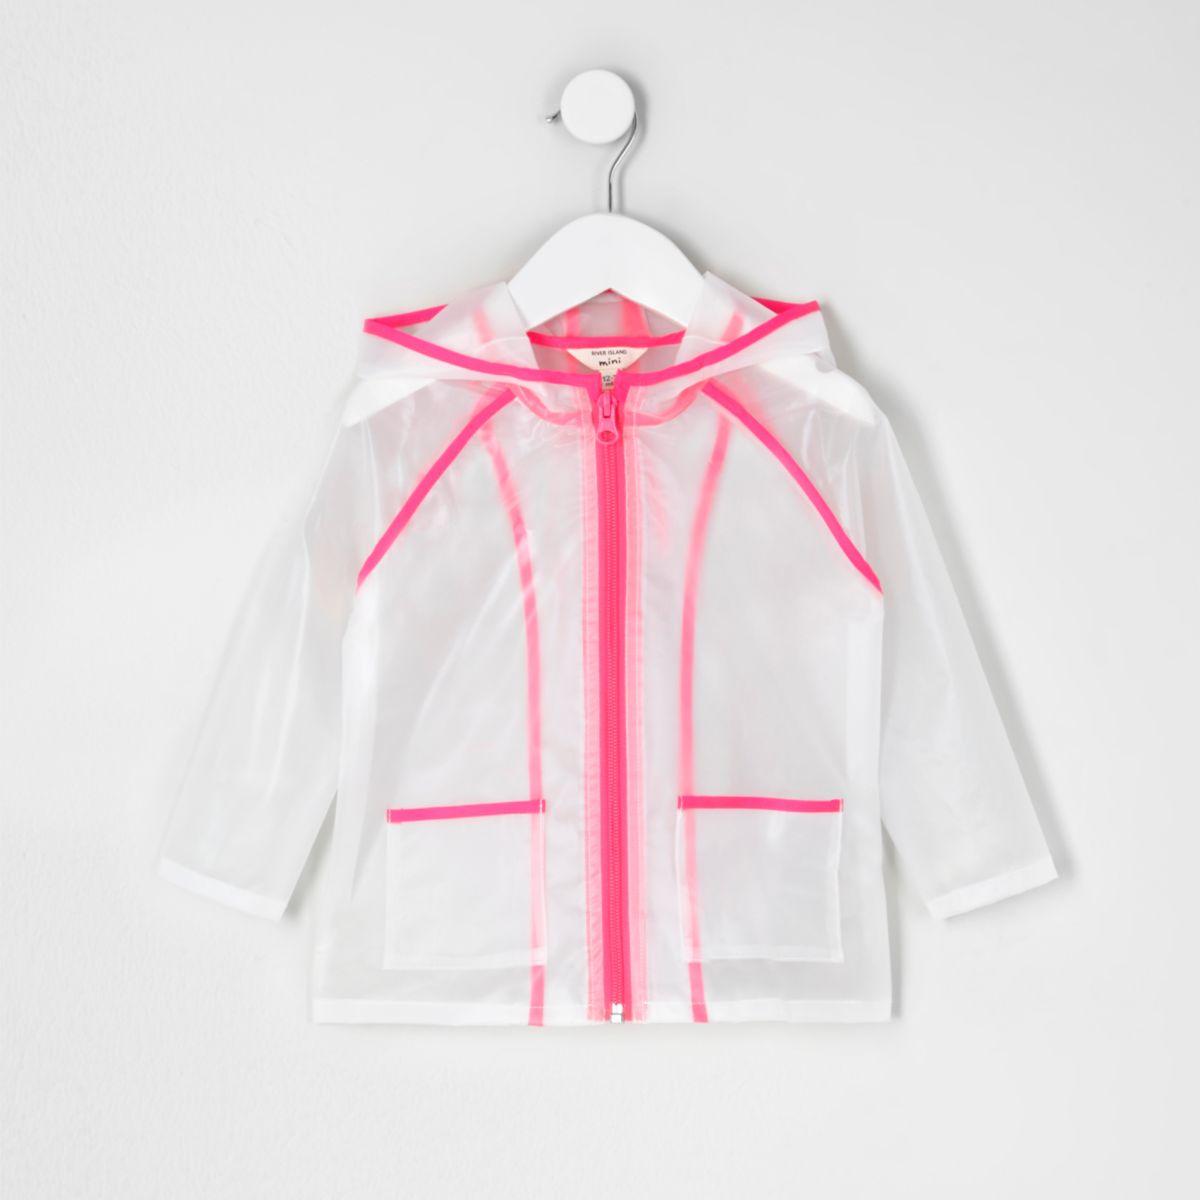 Imperméable rose transparent mini fille